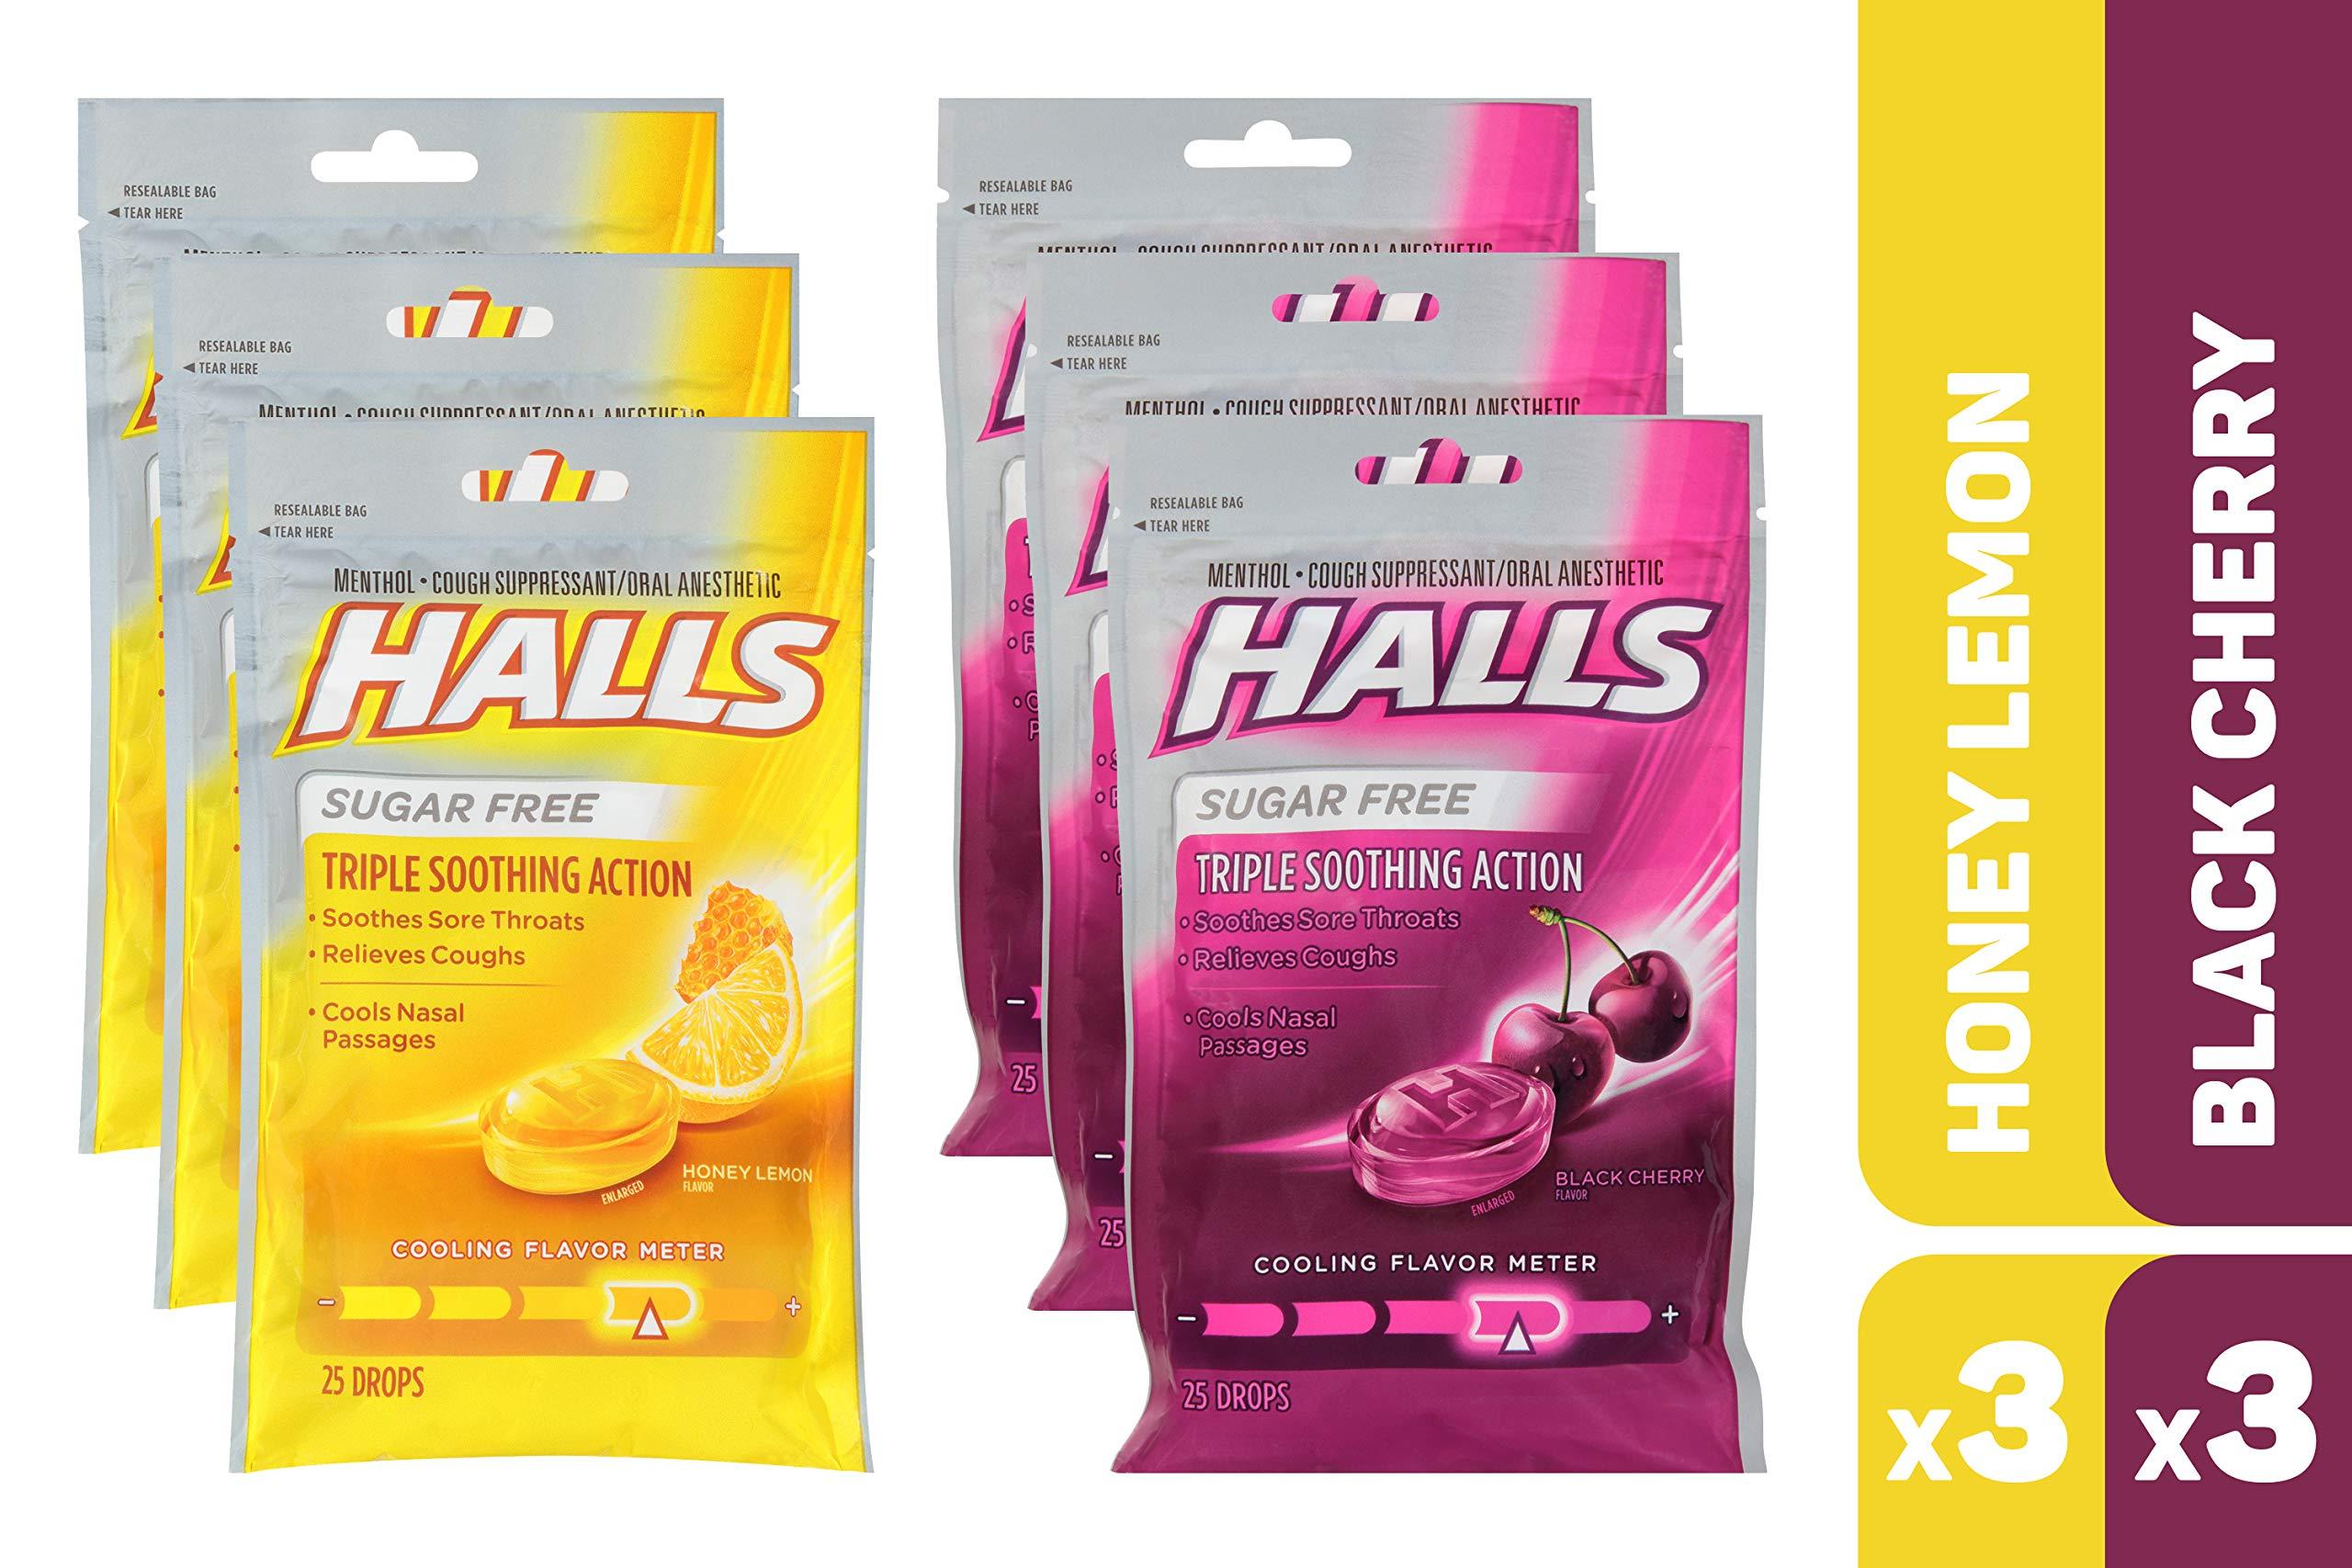 HALLS Sugar Free Cough Drops Honey Lemon & Black Cherry Variety Pack - 150 total drops by Halls (Image #1)